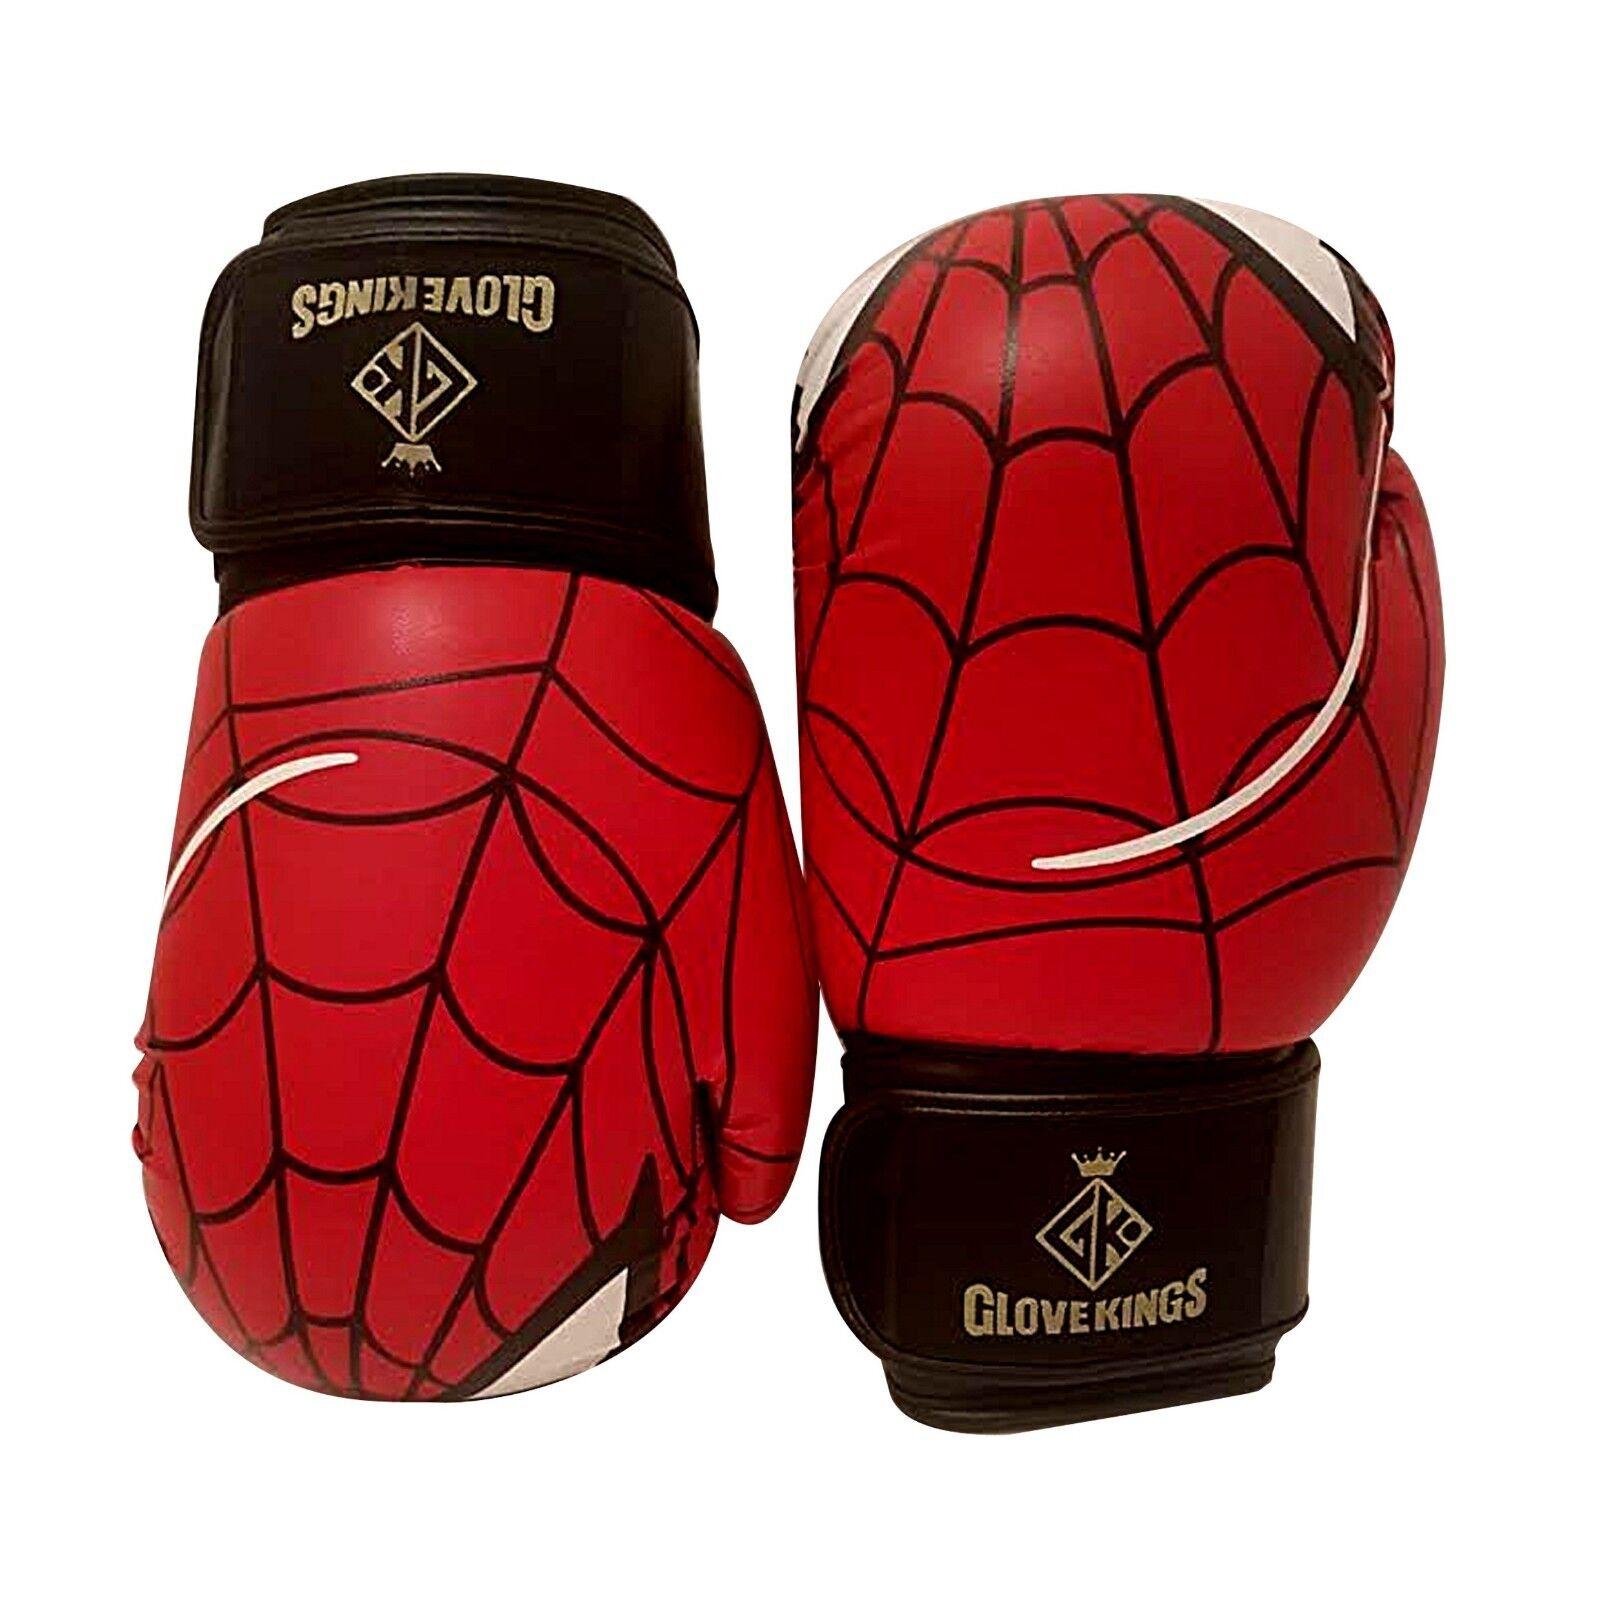 GK Spiderman Guantoni Da Boxe K1 Muay Thai MMA UFC In Pelle 8oz Kids